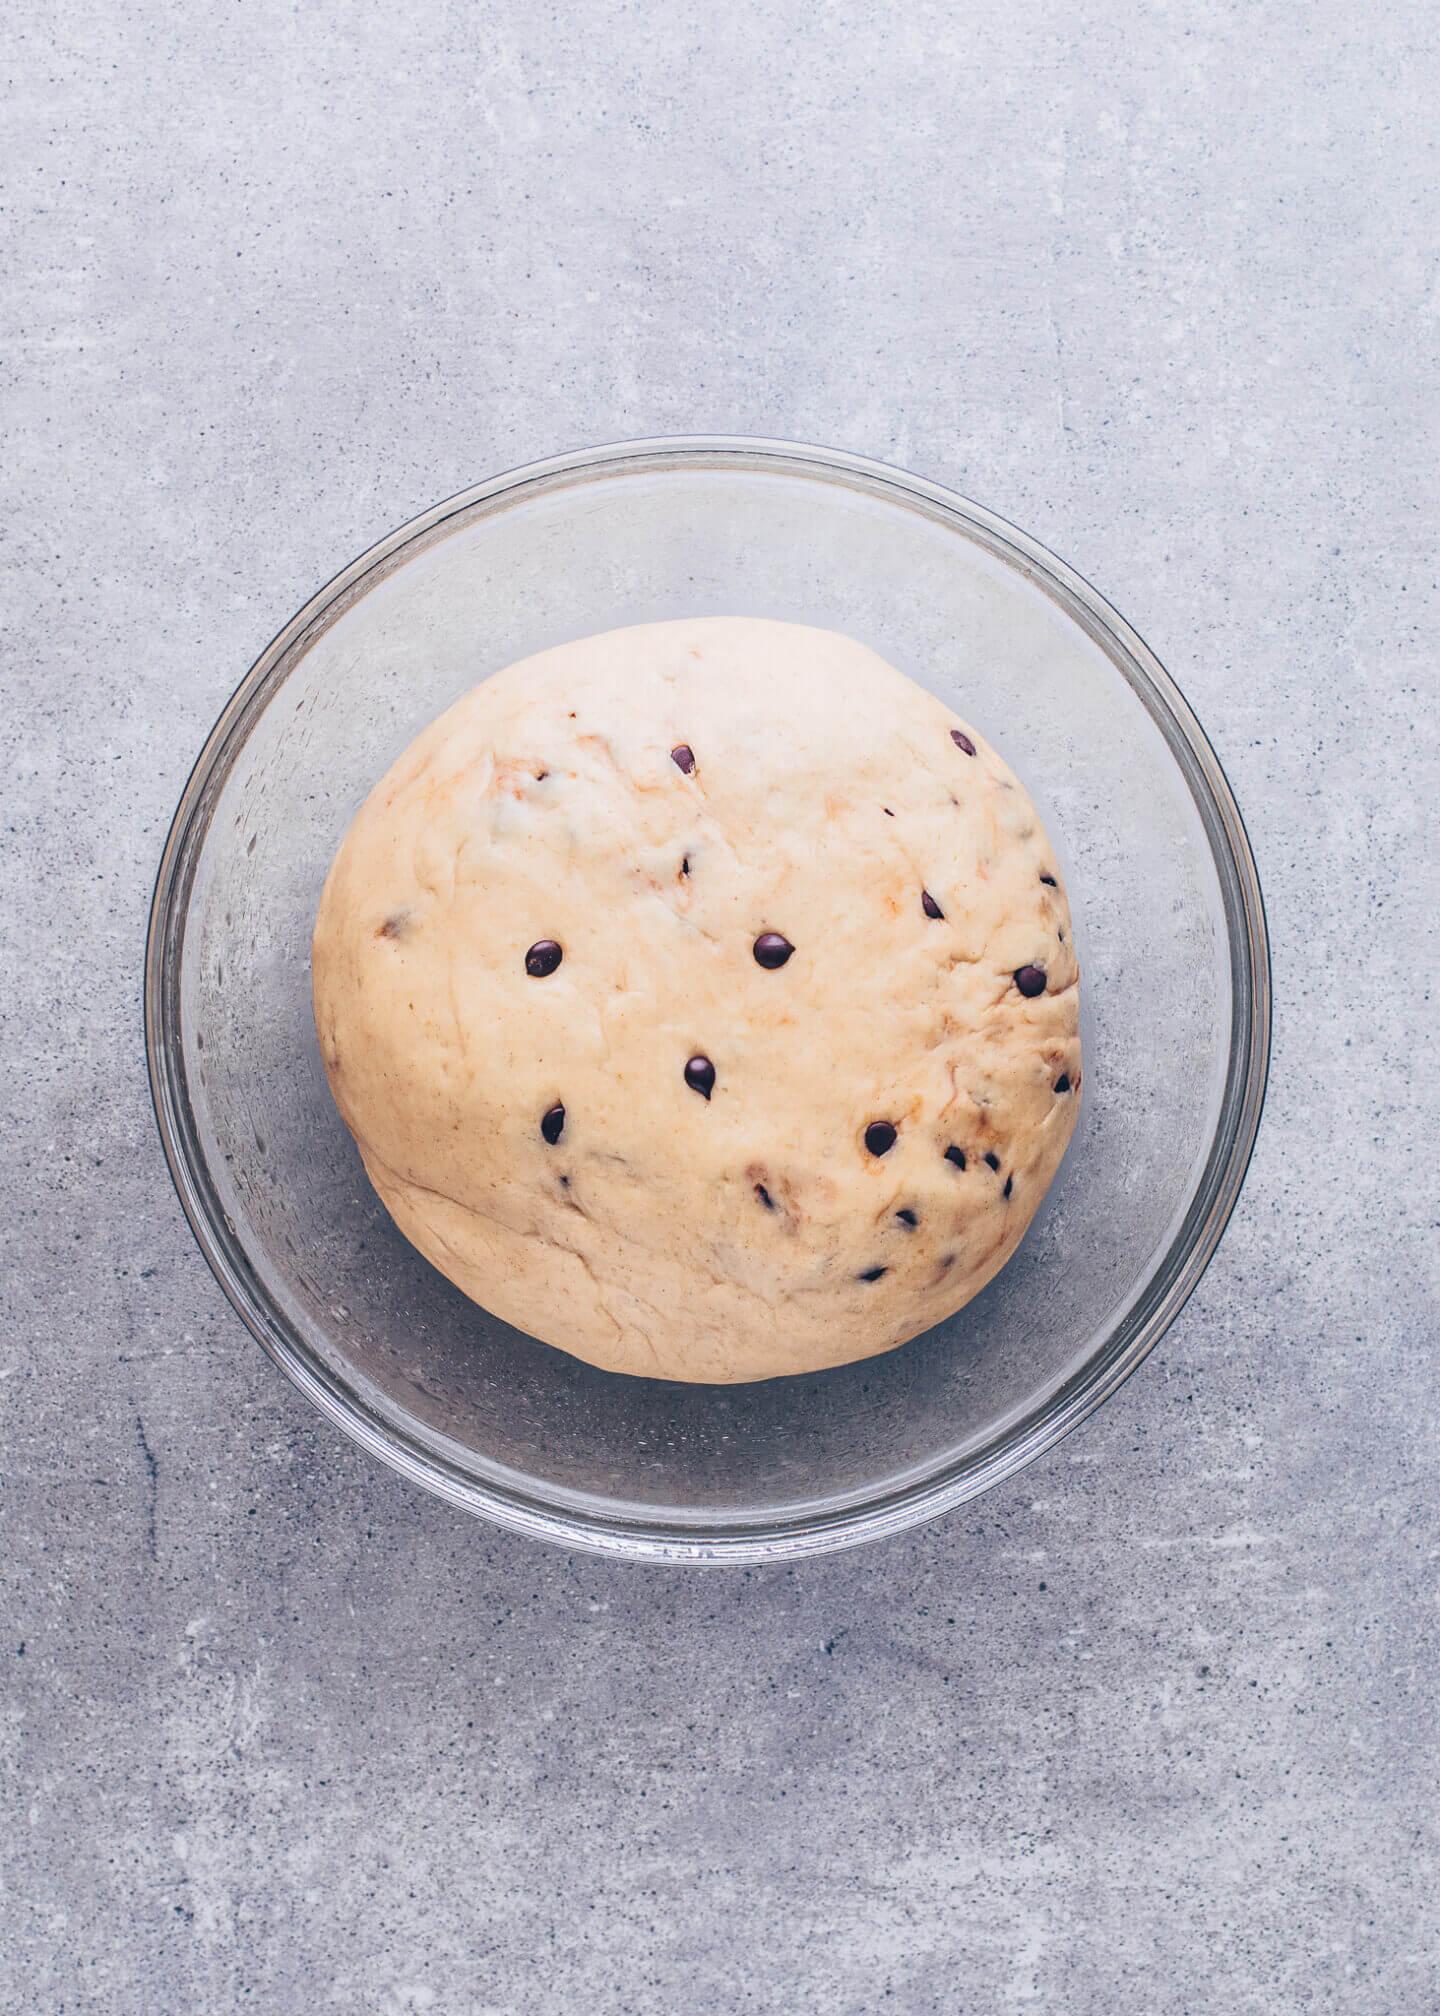 How to make Chocolate Brioche Buns